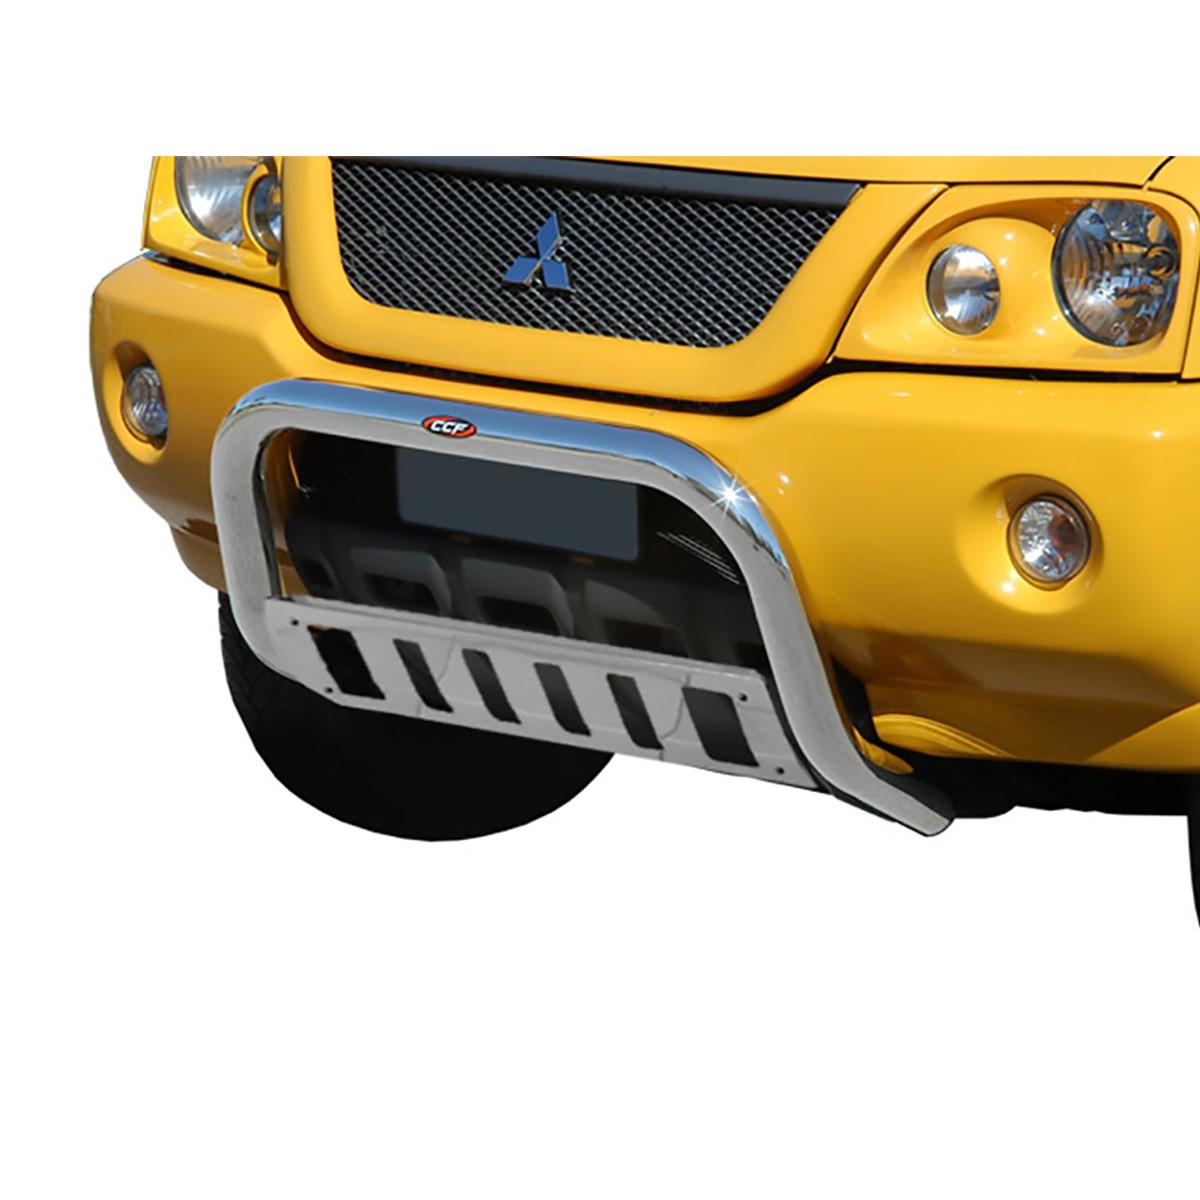 Parachoque impuls�o cromado L200 Sport 2004 a 2007 ou L200 Outdoor 2007 a 2012